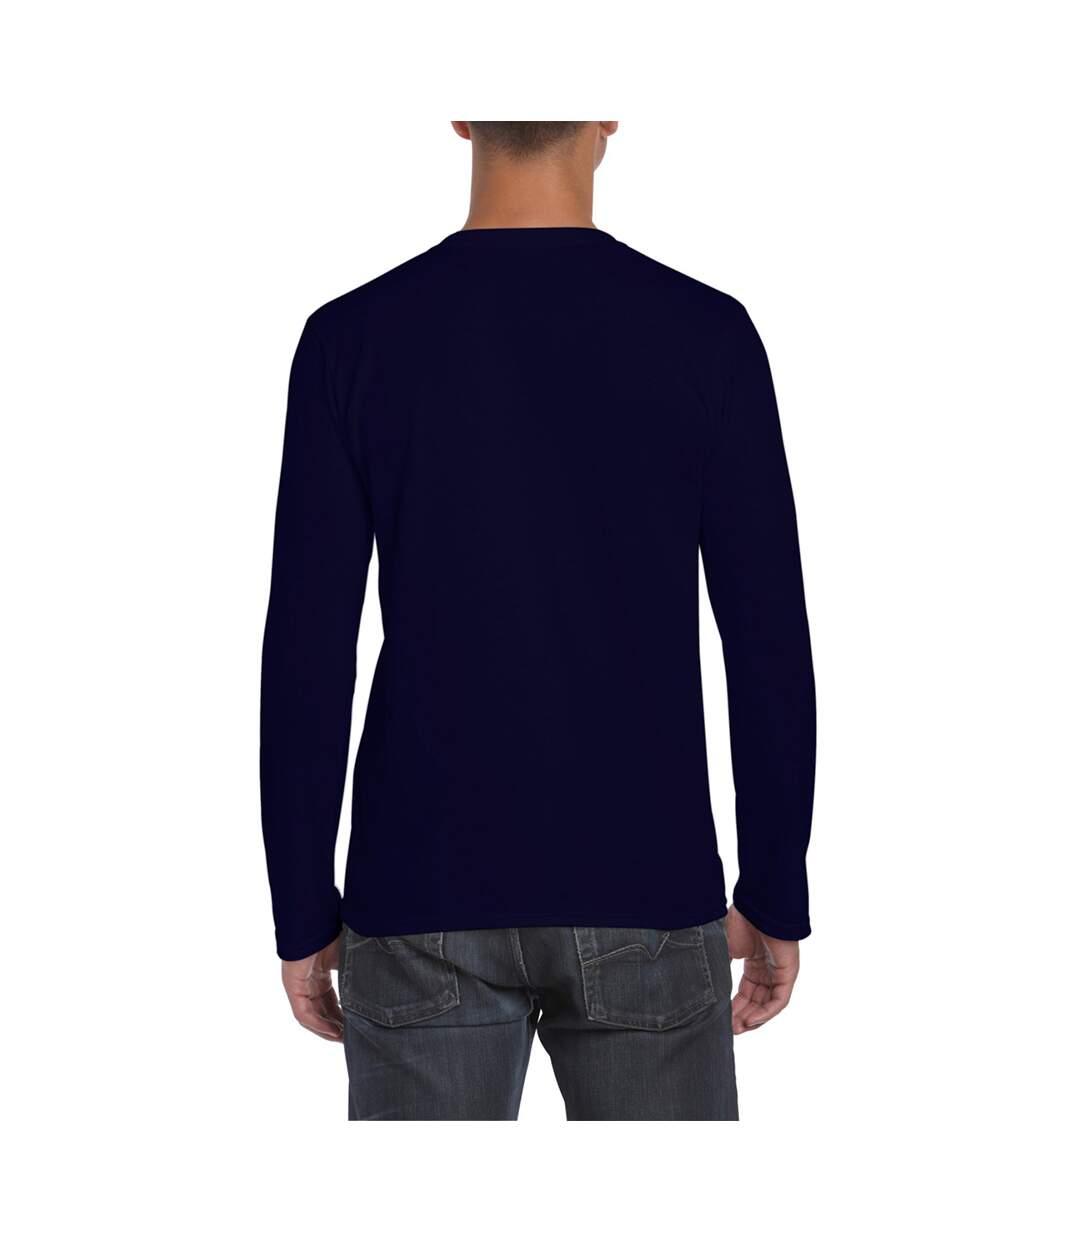 Gildan Mens Soft Style Long Sleeve T-Shirt (Pack Of 5) (Navy) - UTBC4808